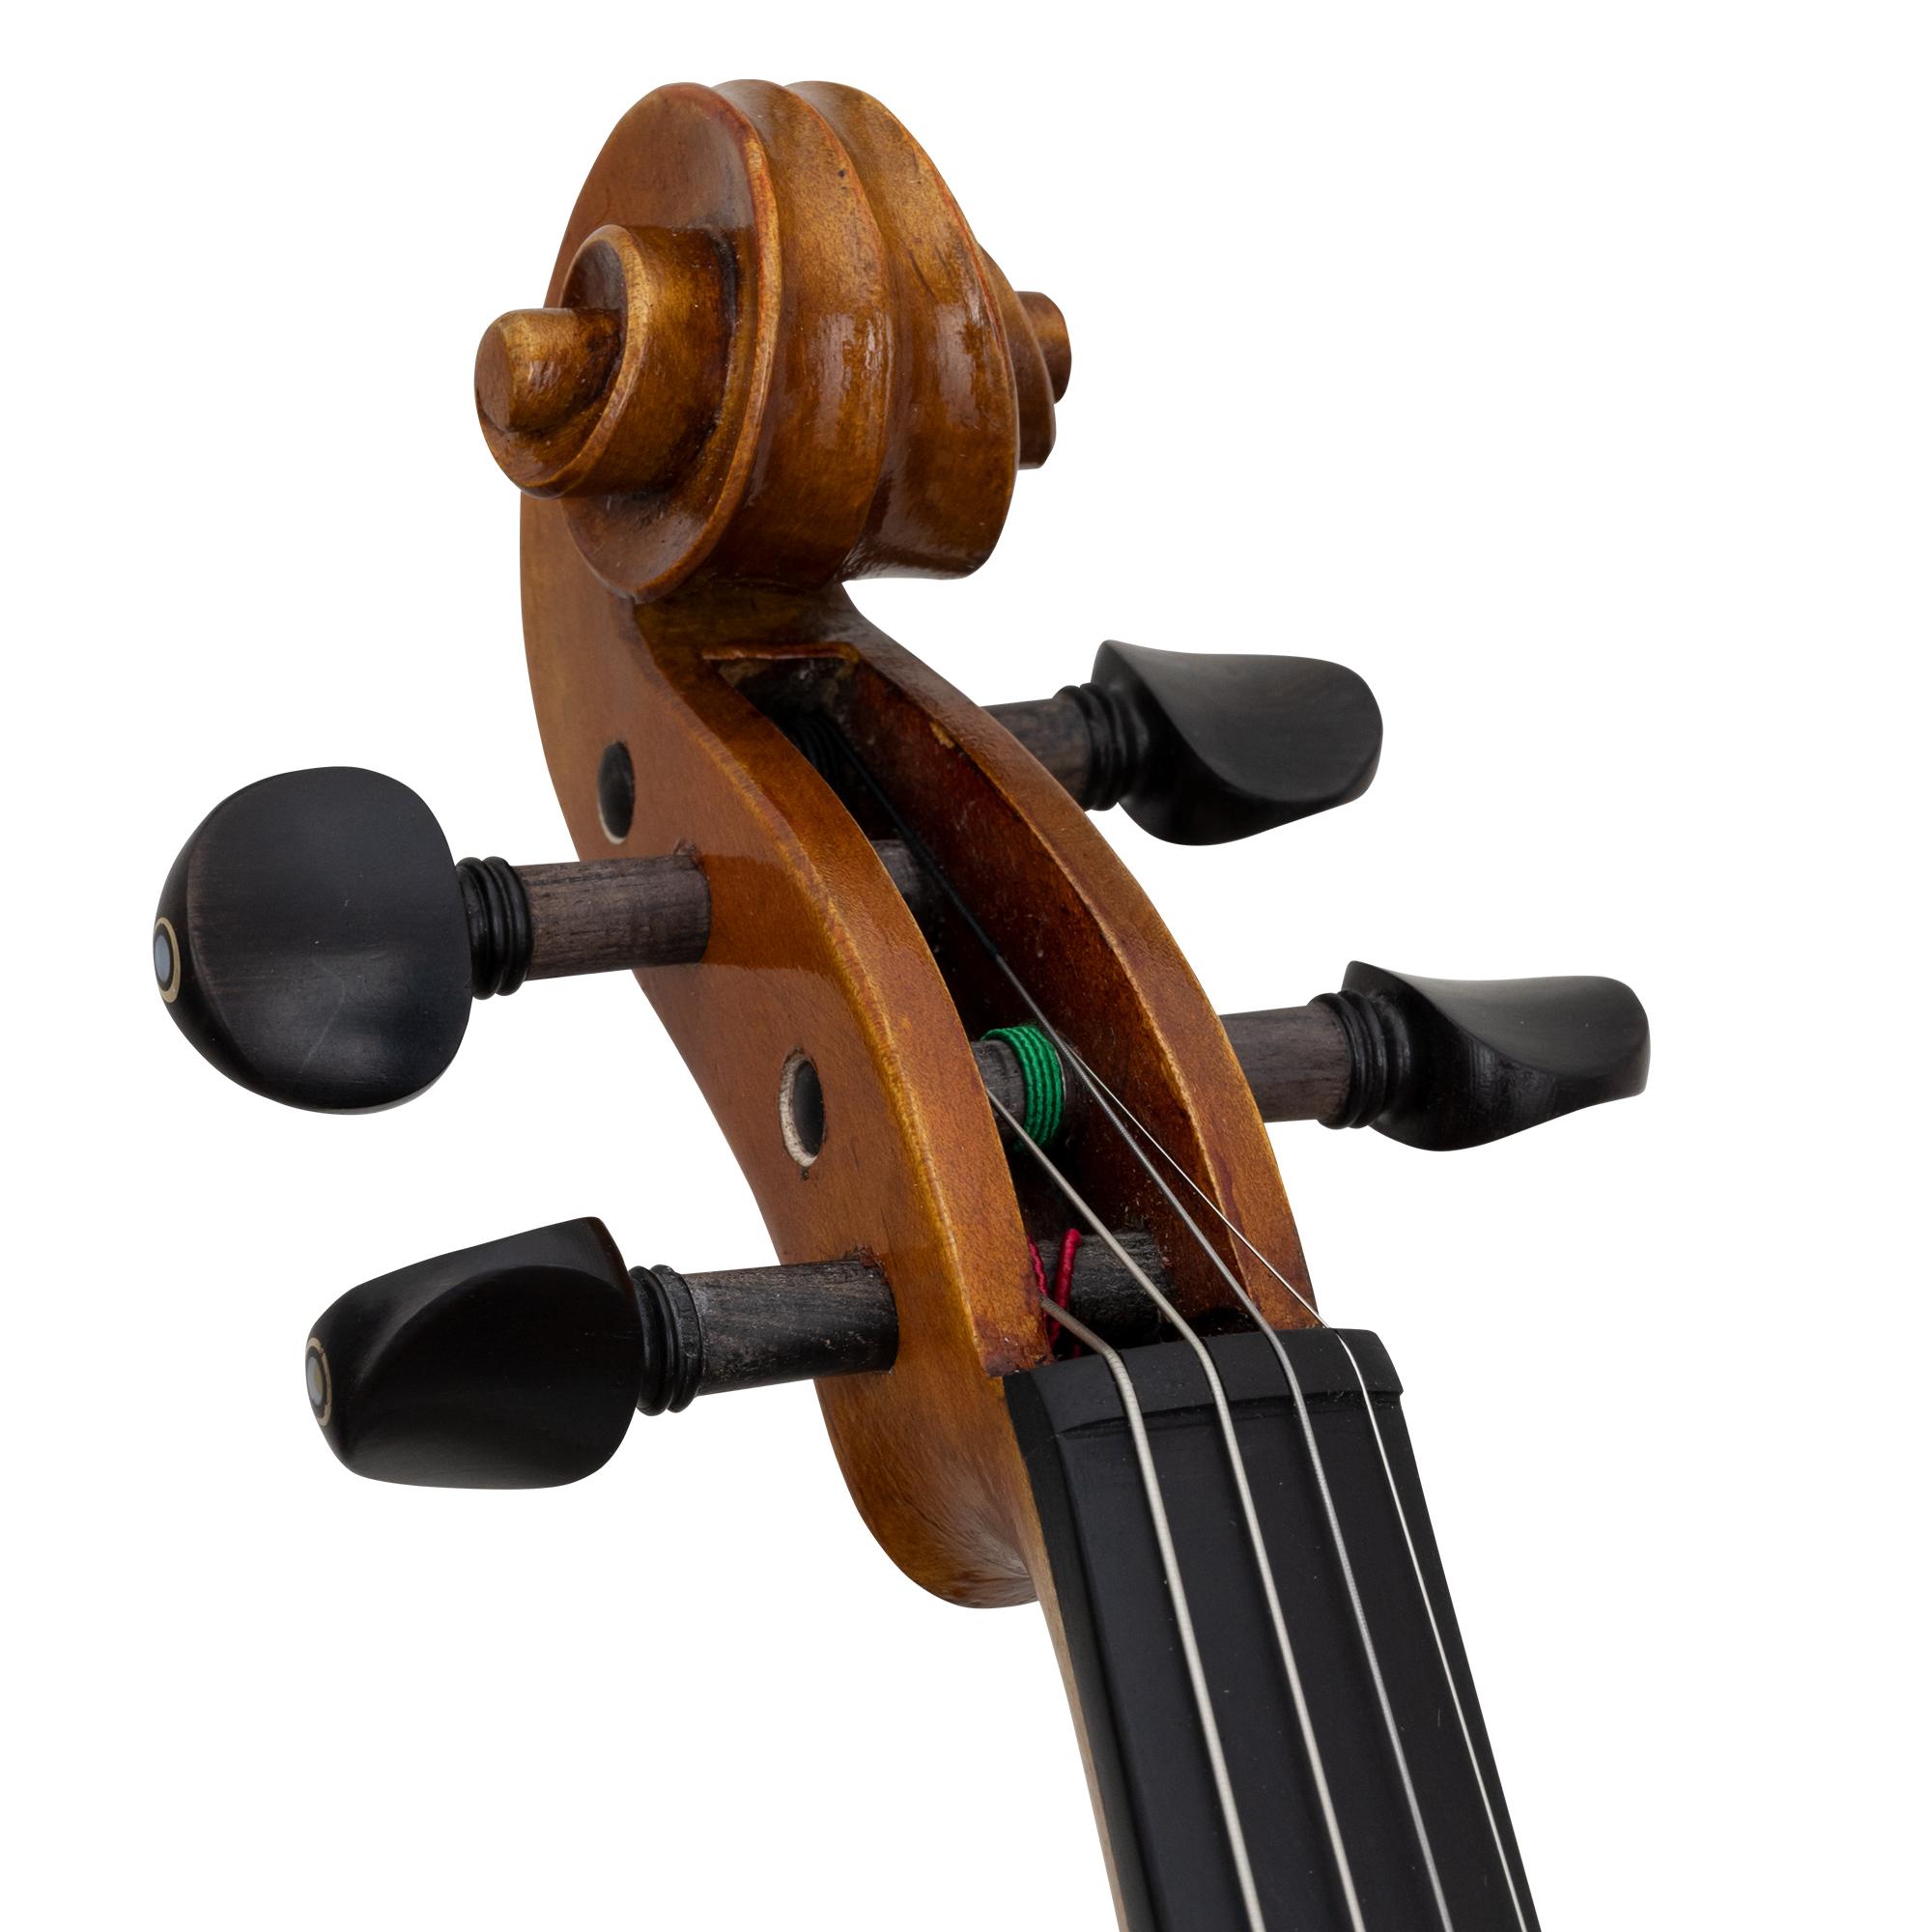 Franke Henner Violin Outfit in action